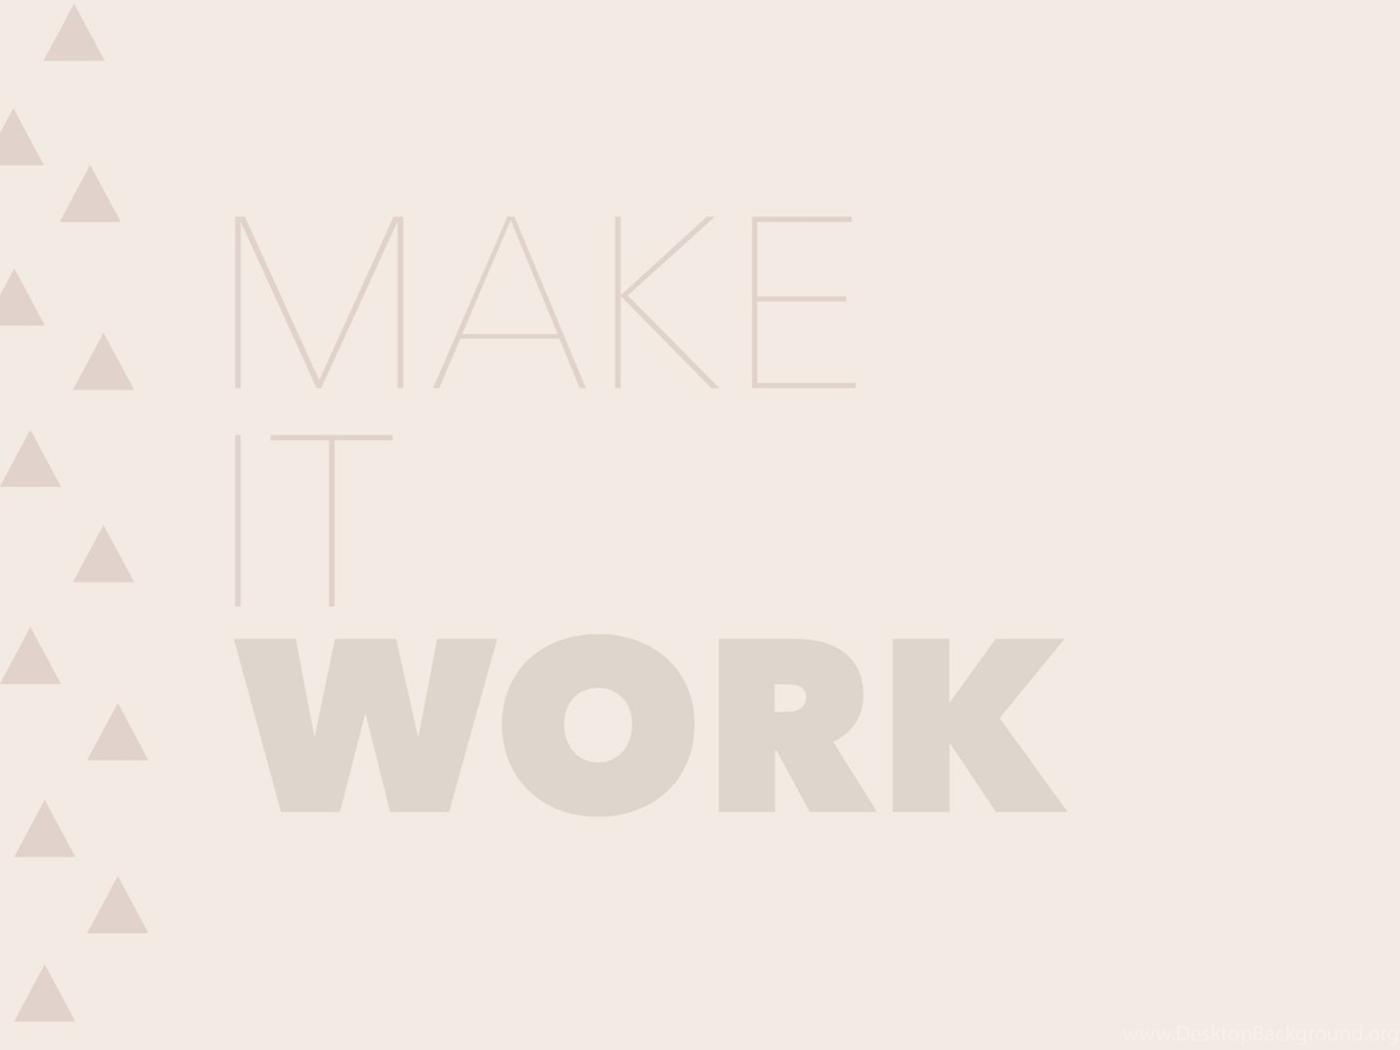 Free Download Make It Work Desktop Wallpapers Keeping The Creativity Desktop Background